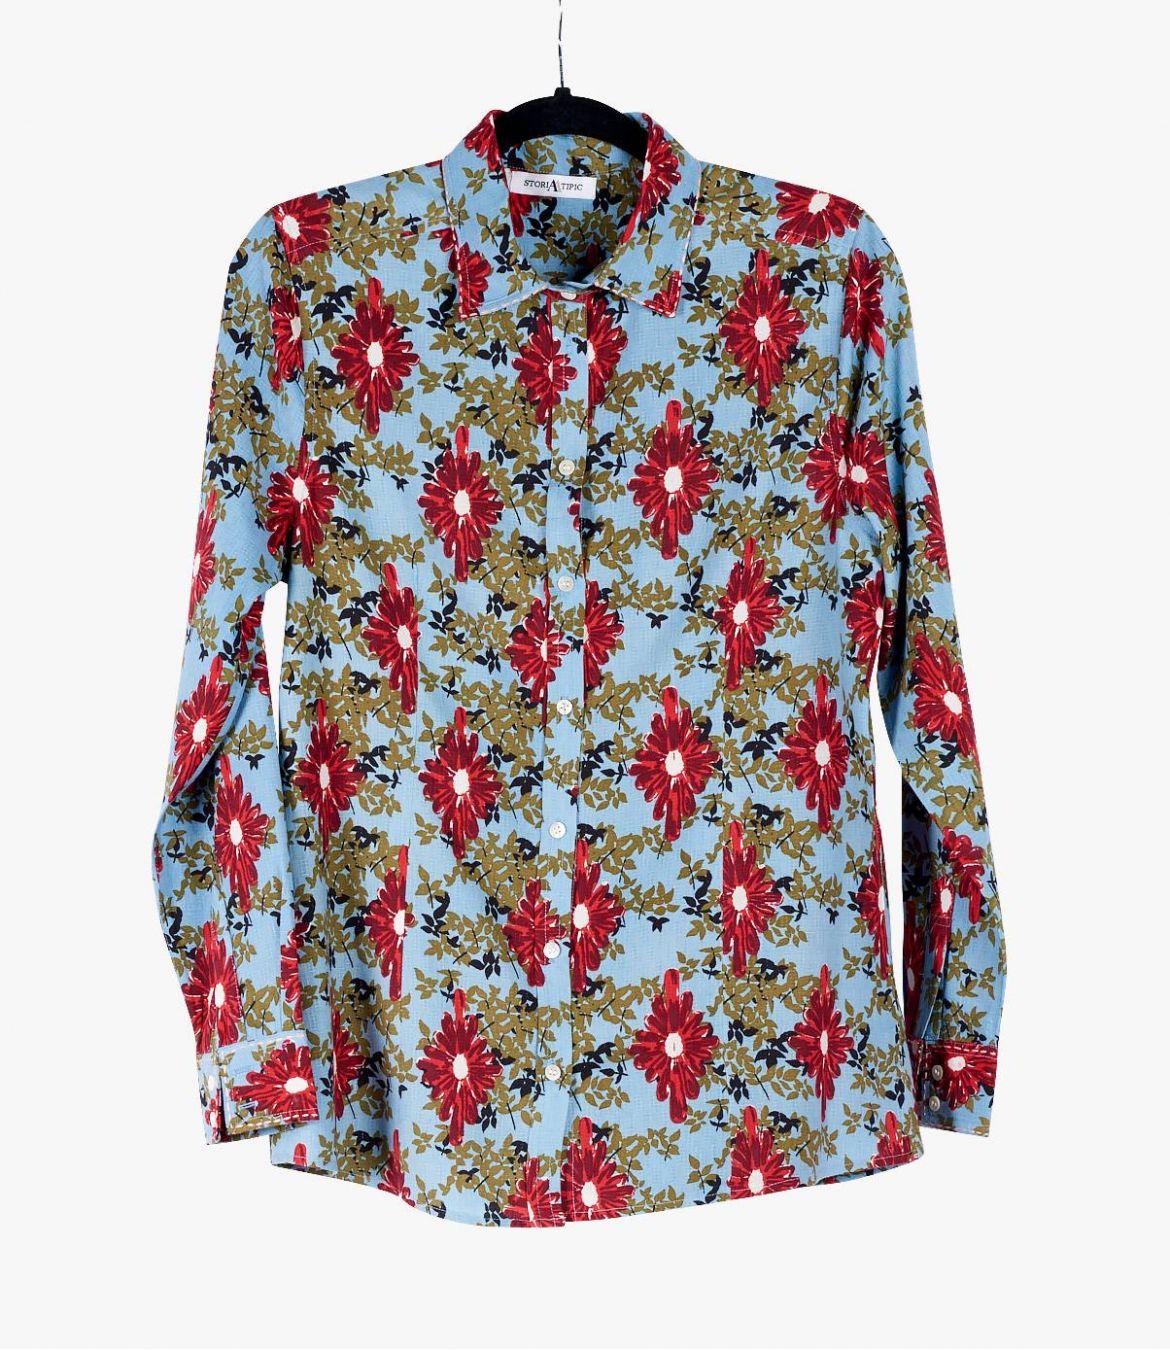 BONI ALEA Cotton Shirt, Women's Modal Storiatipic - 2